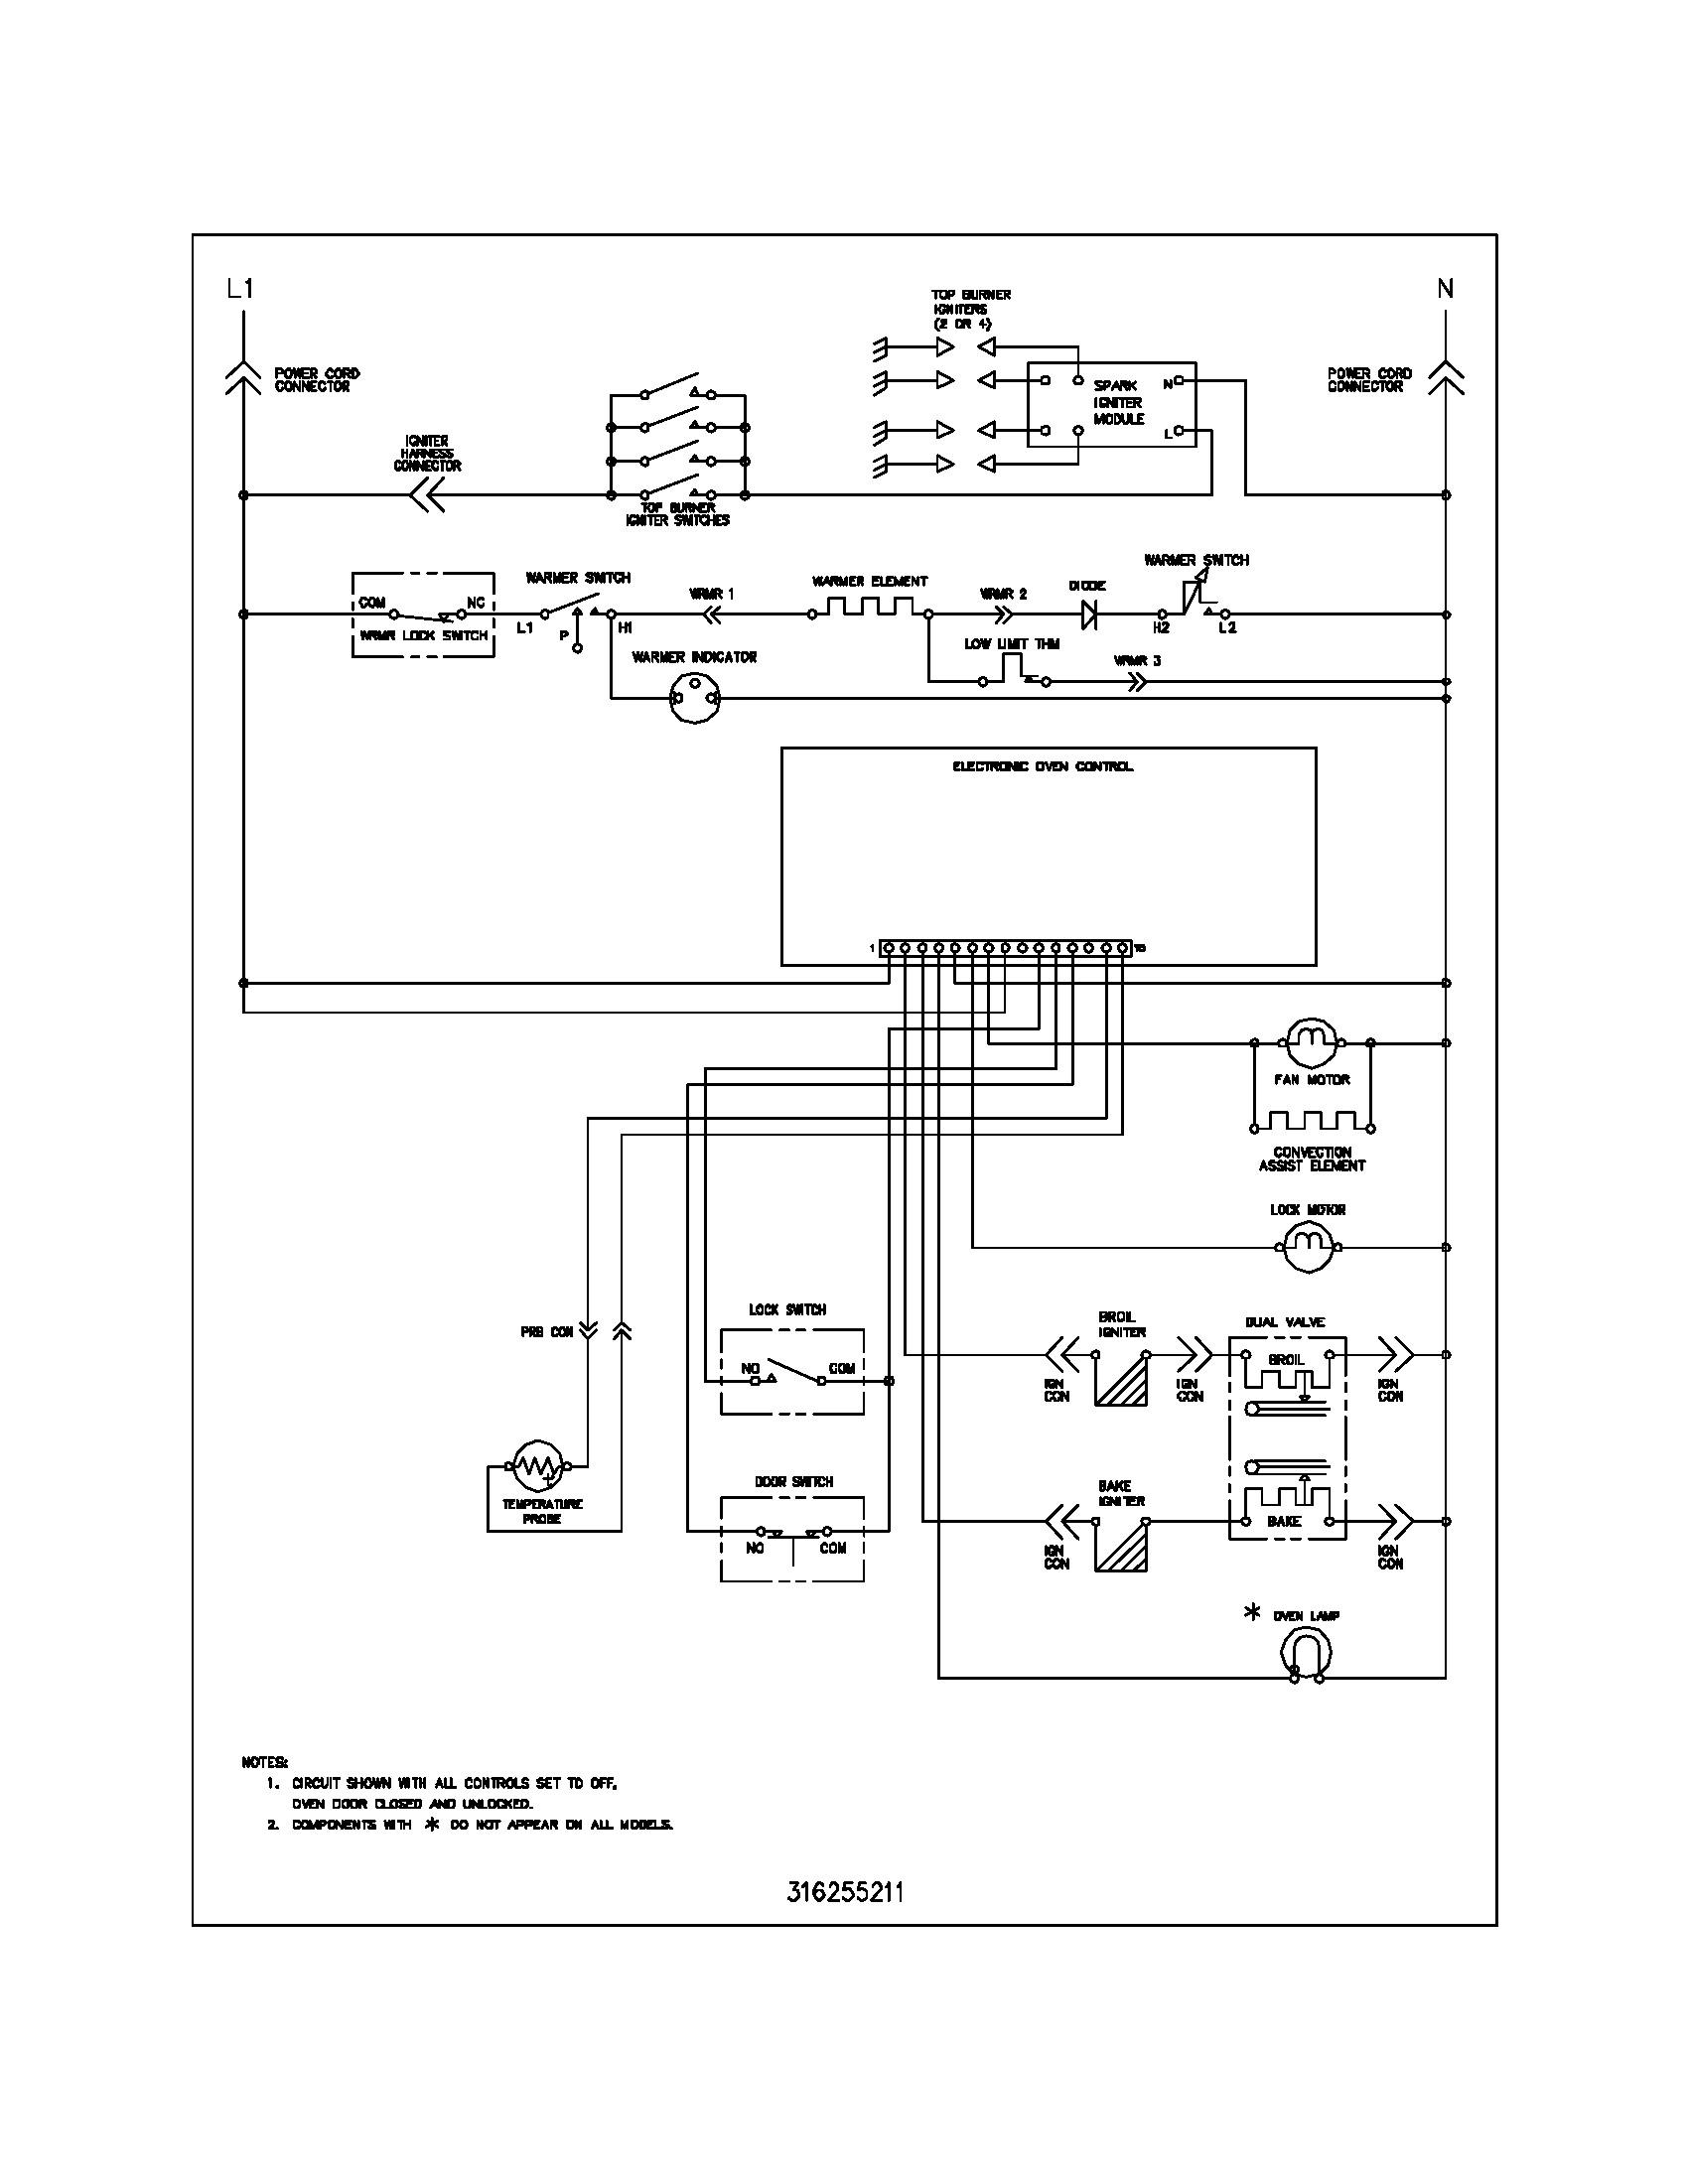 Older Gas Furnace Wiring Diagram Bryant Fine Design General Electric Frigidaire Of